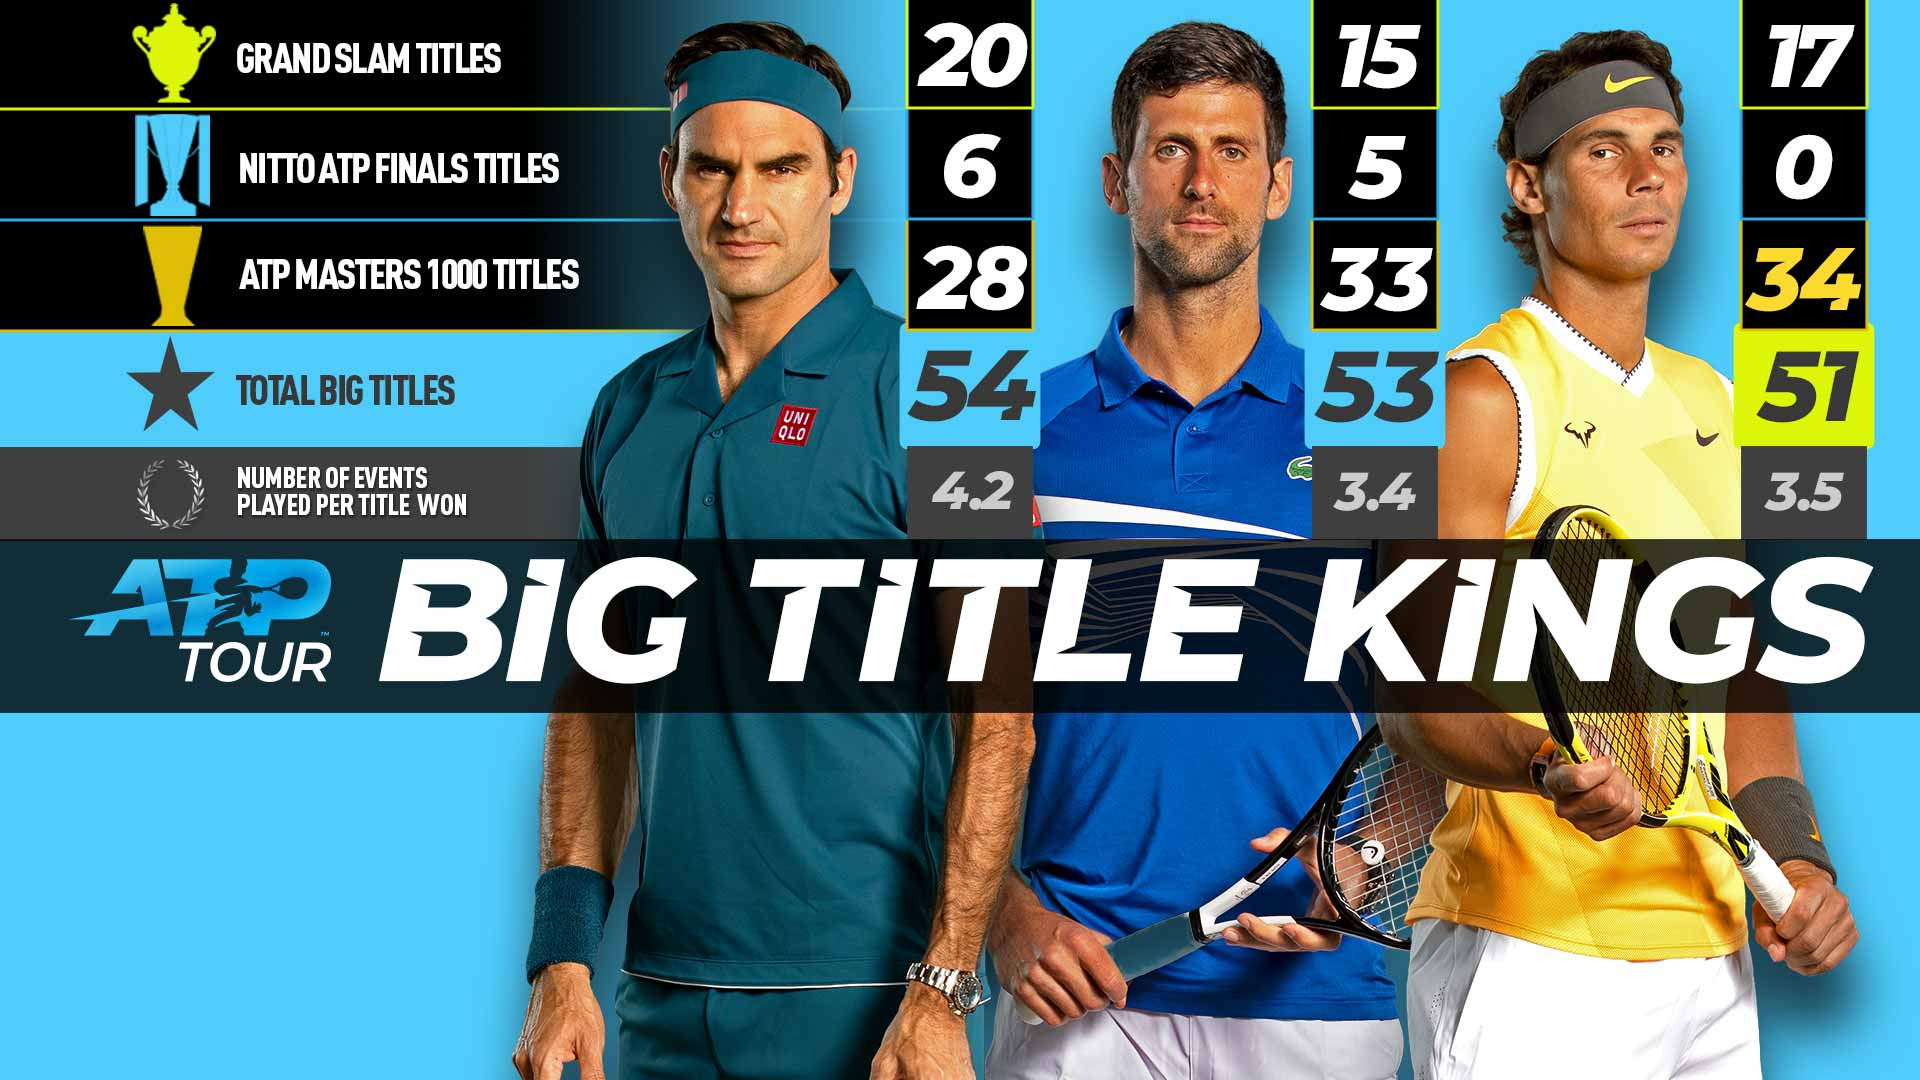 Rafael Nadal Claws Closer To Roger Federer Novak Djokovic In Big Titles Race Atp Tour Tennis